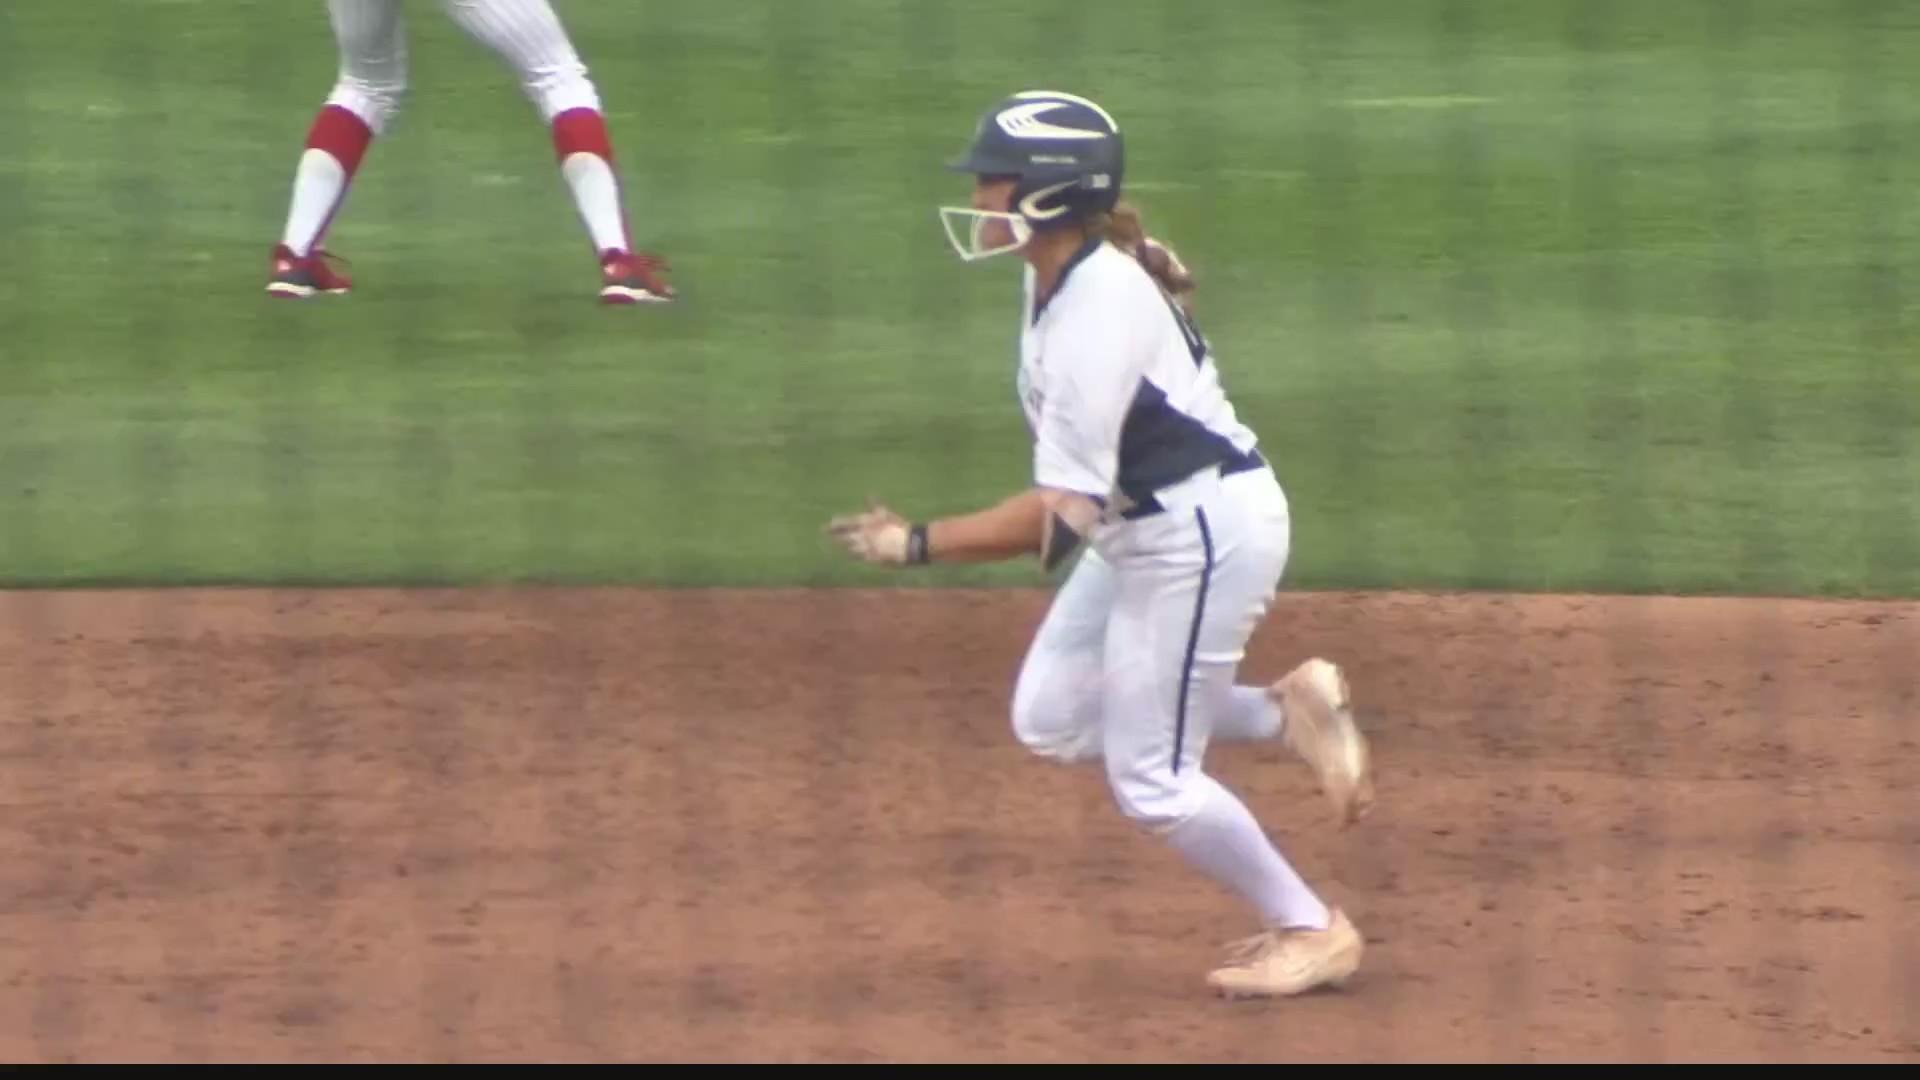 Penn_State_softball_taking_on_Indiana_ag_0_20190507233847